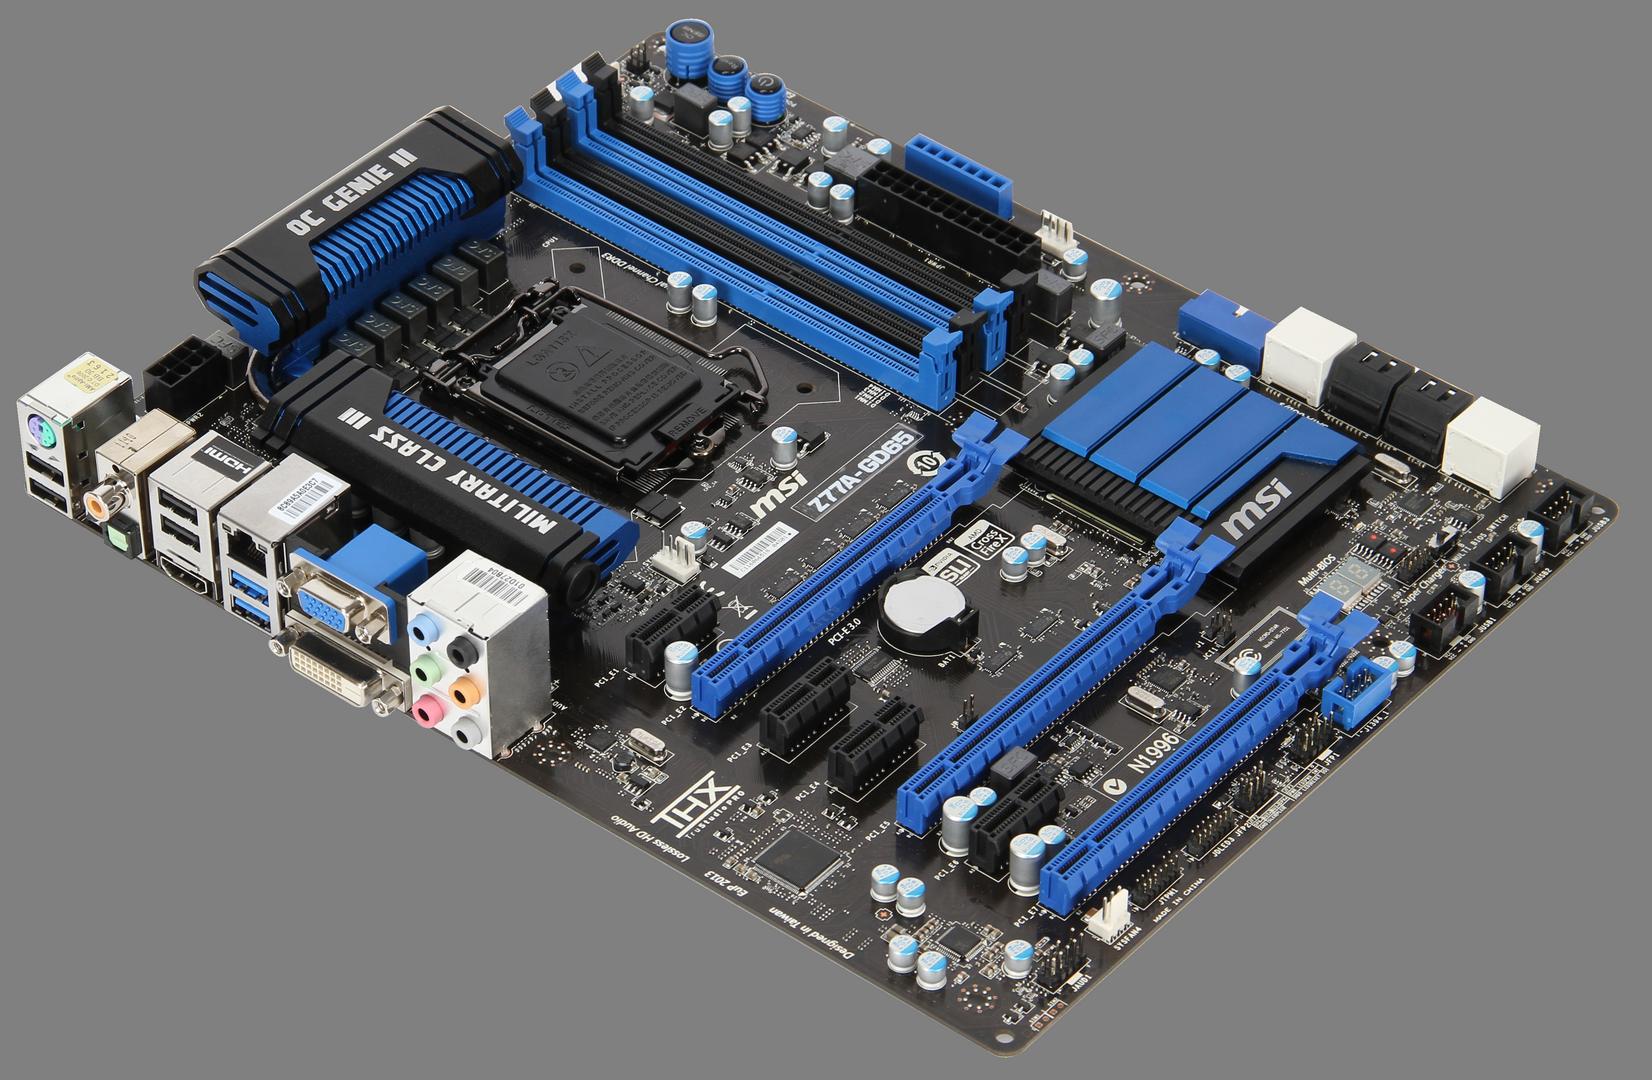 MSI Z77A-GD65